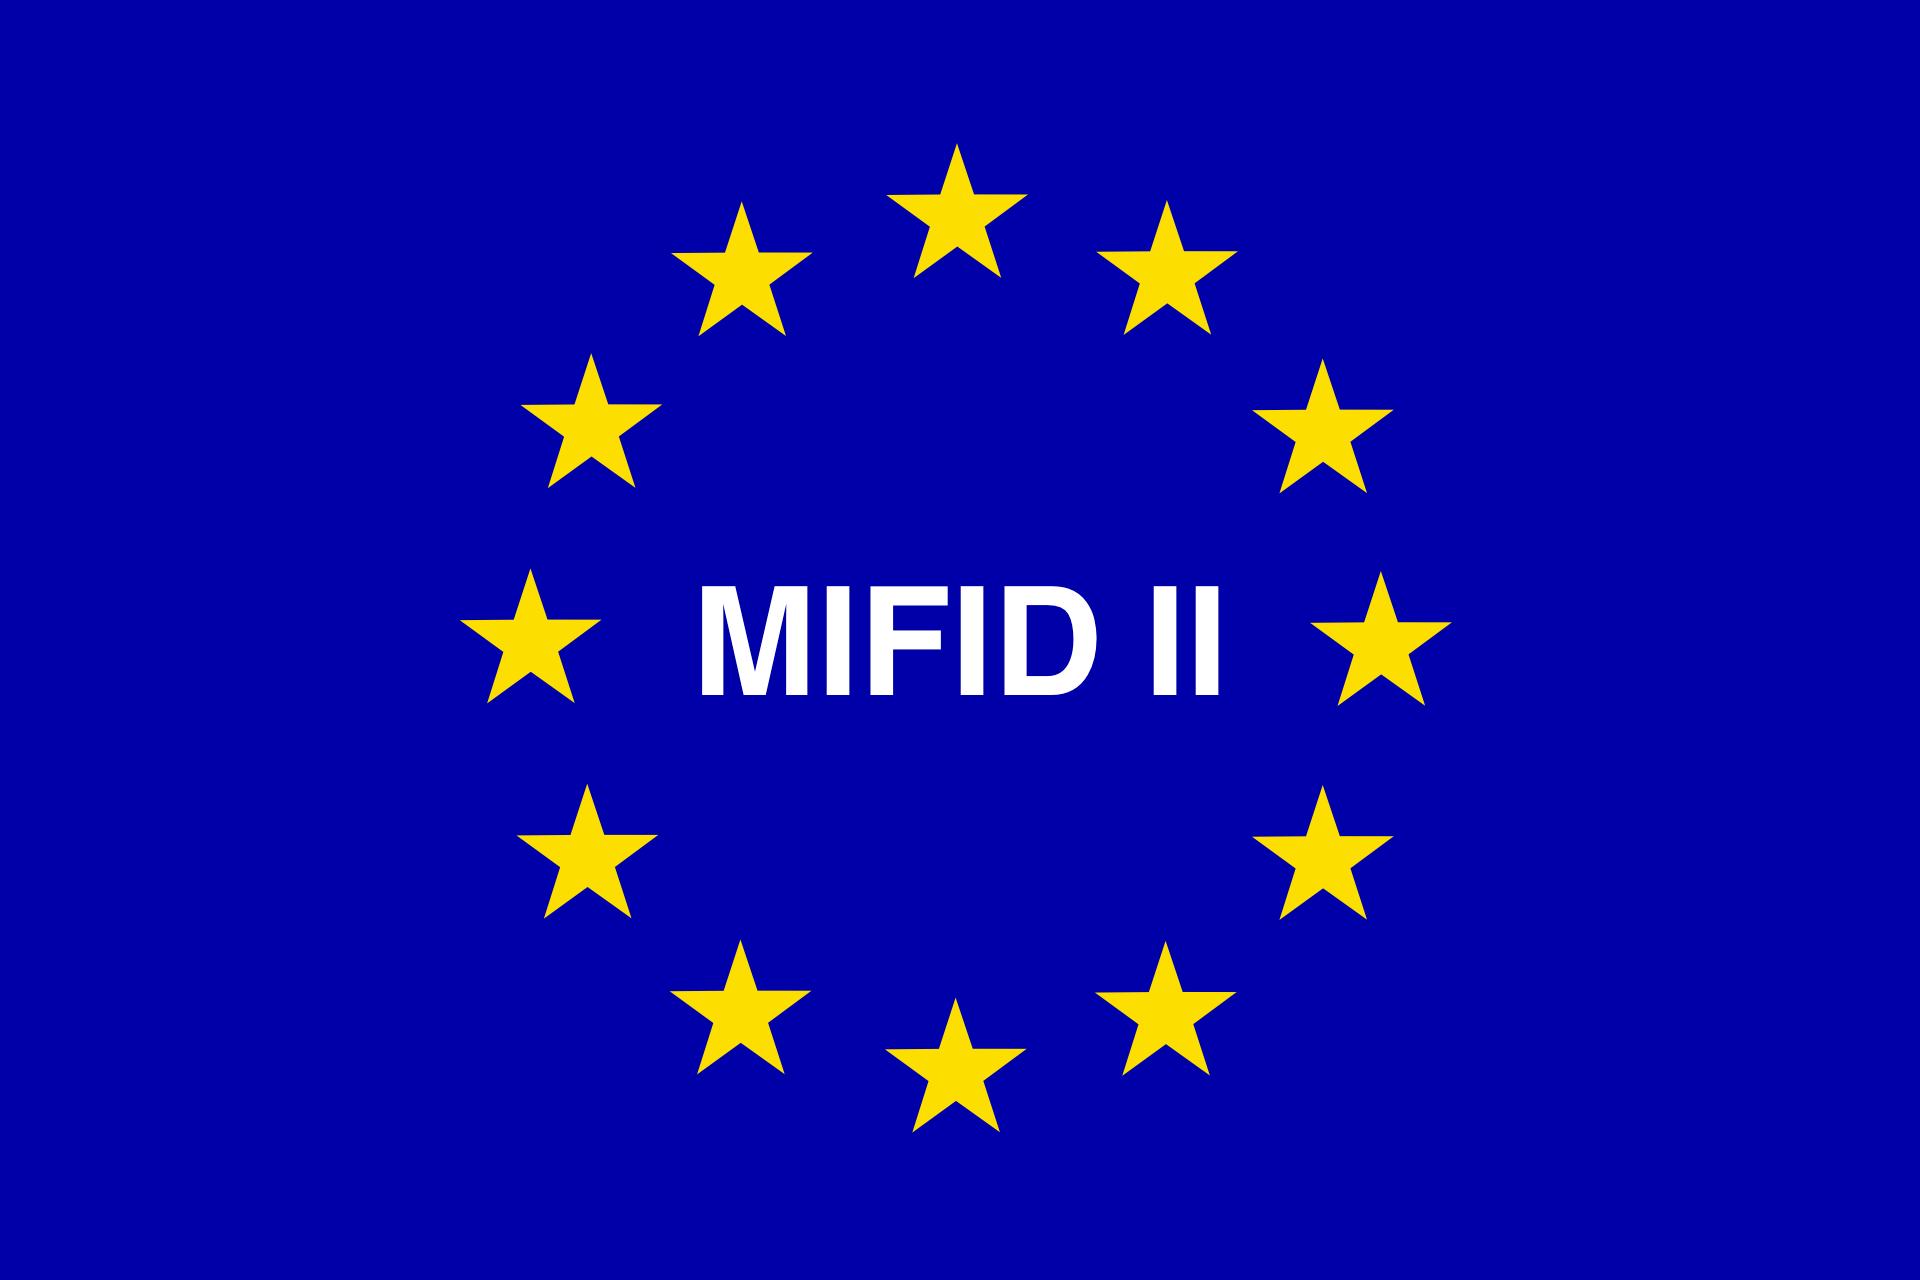 eu flag bright blue_Mifid 2.png